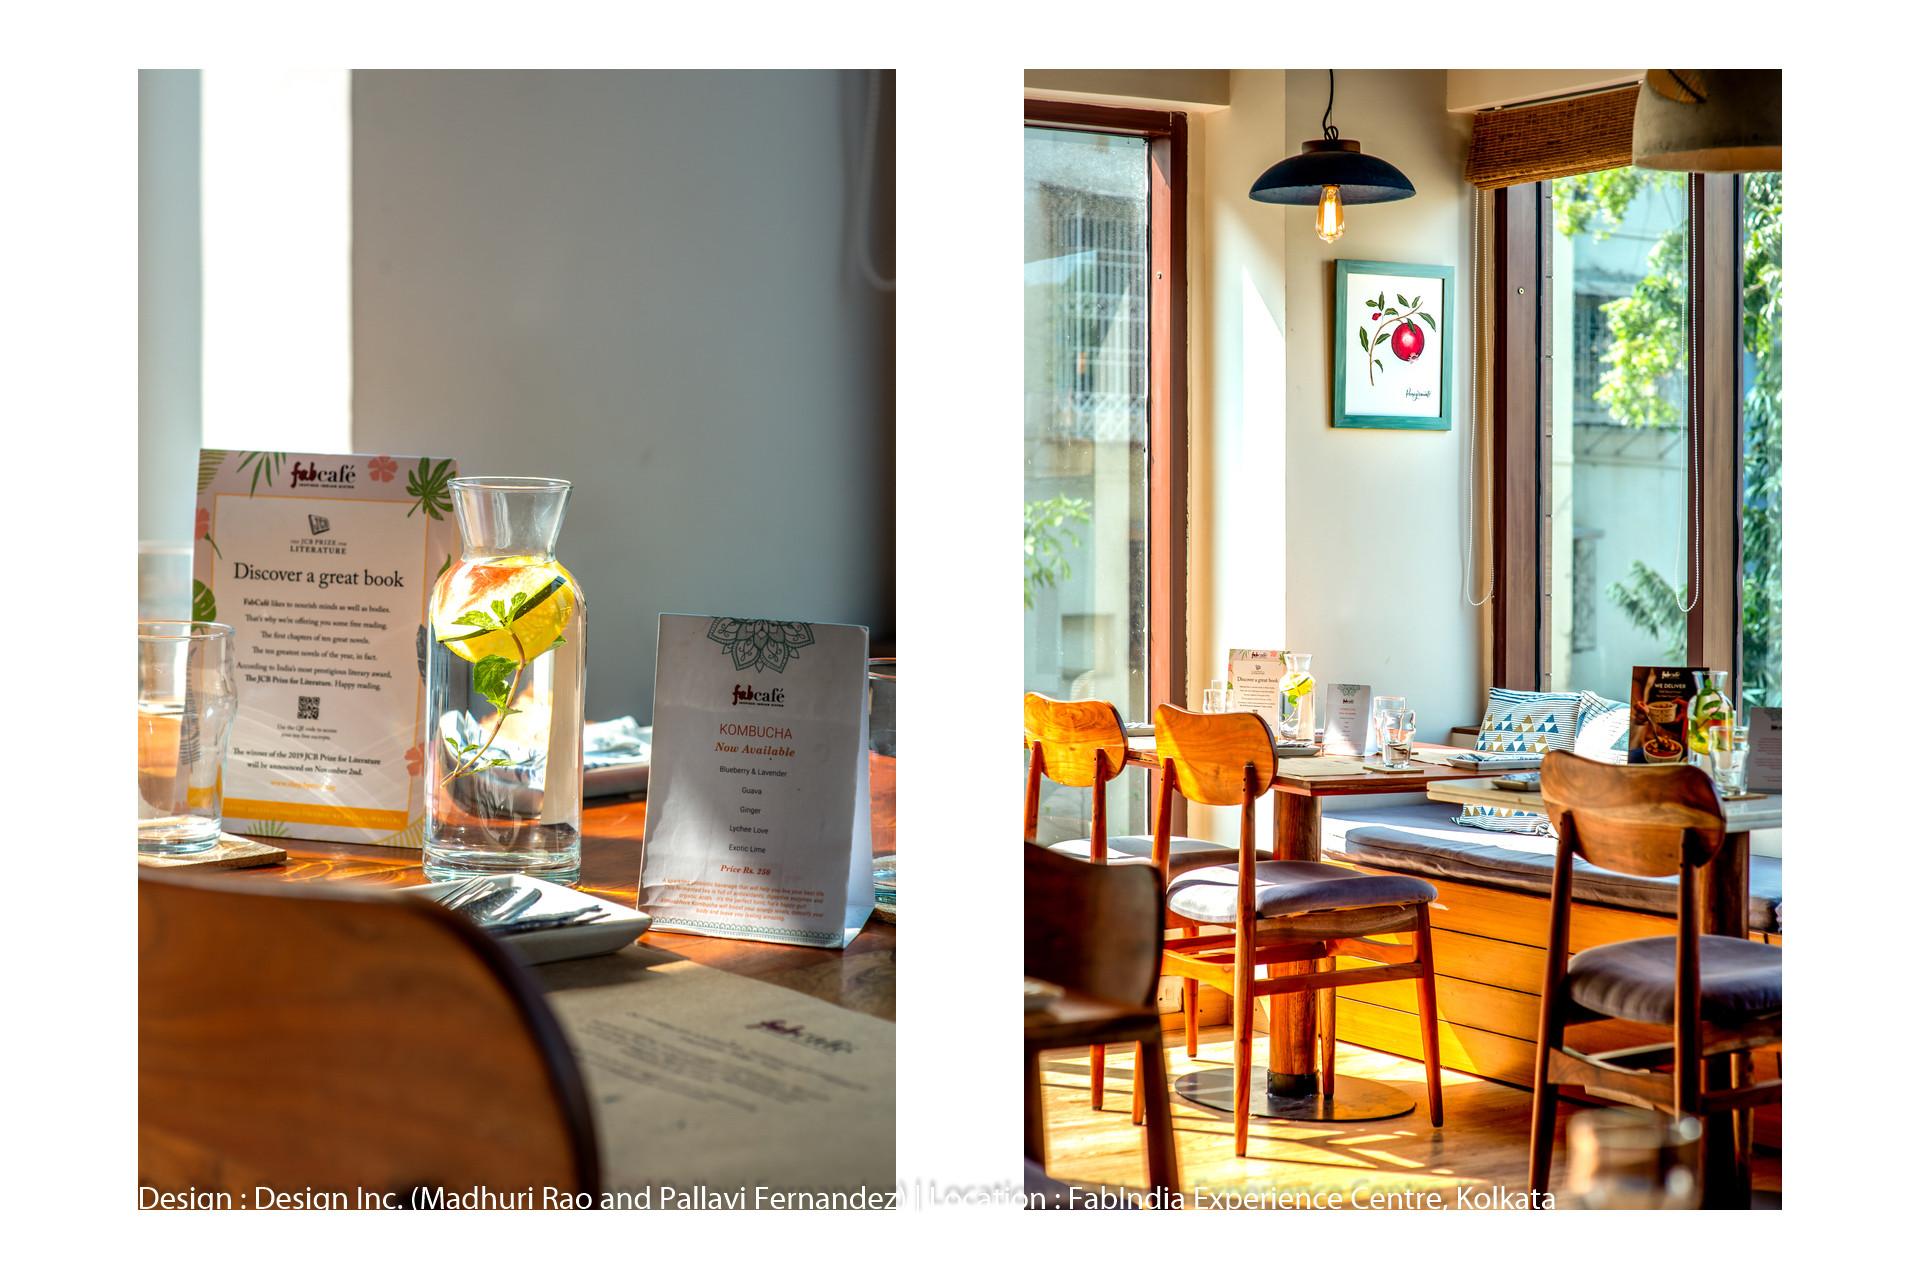 daylight restaurant photography ideas.jp